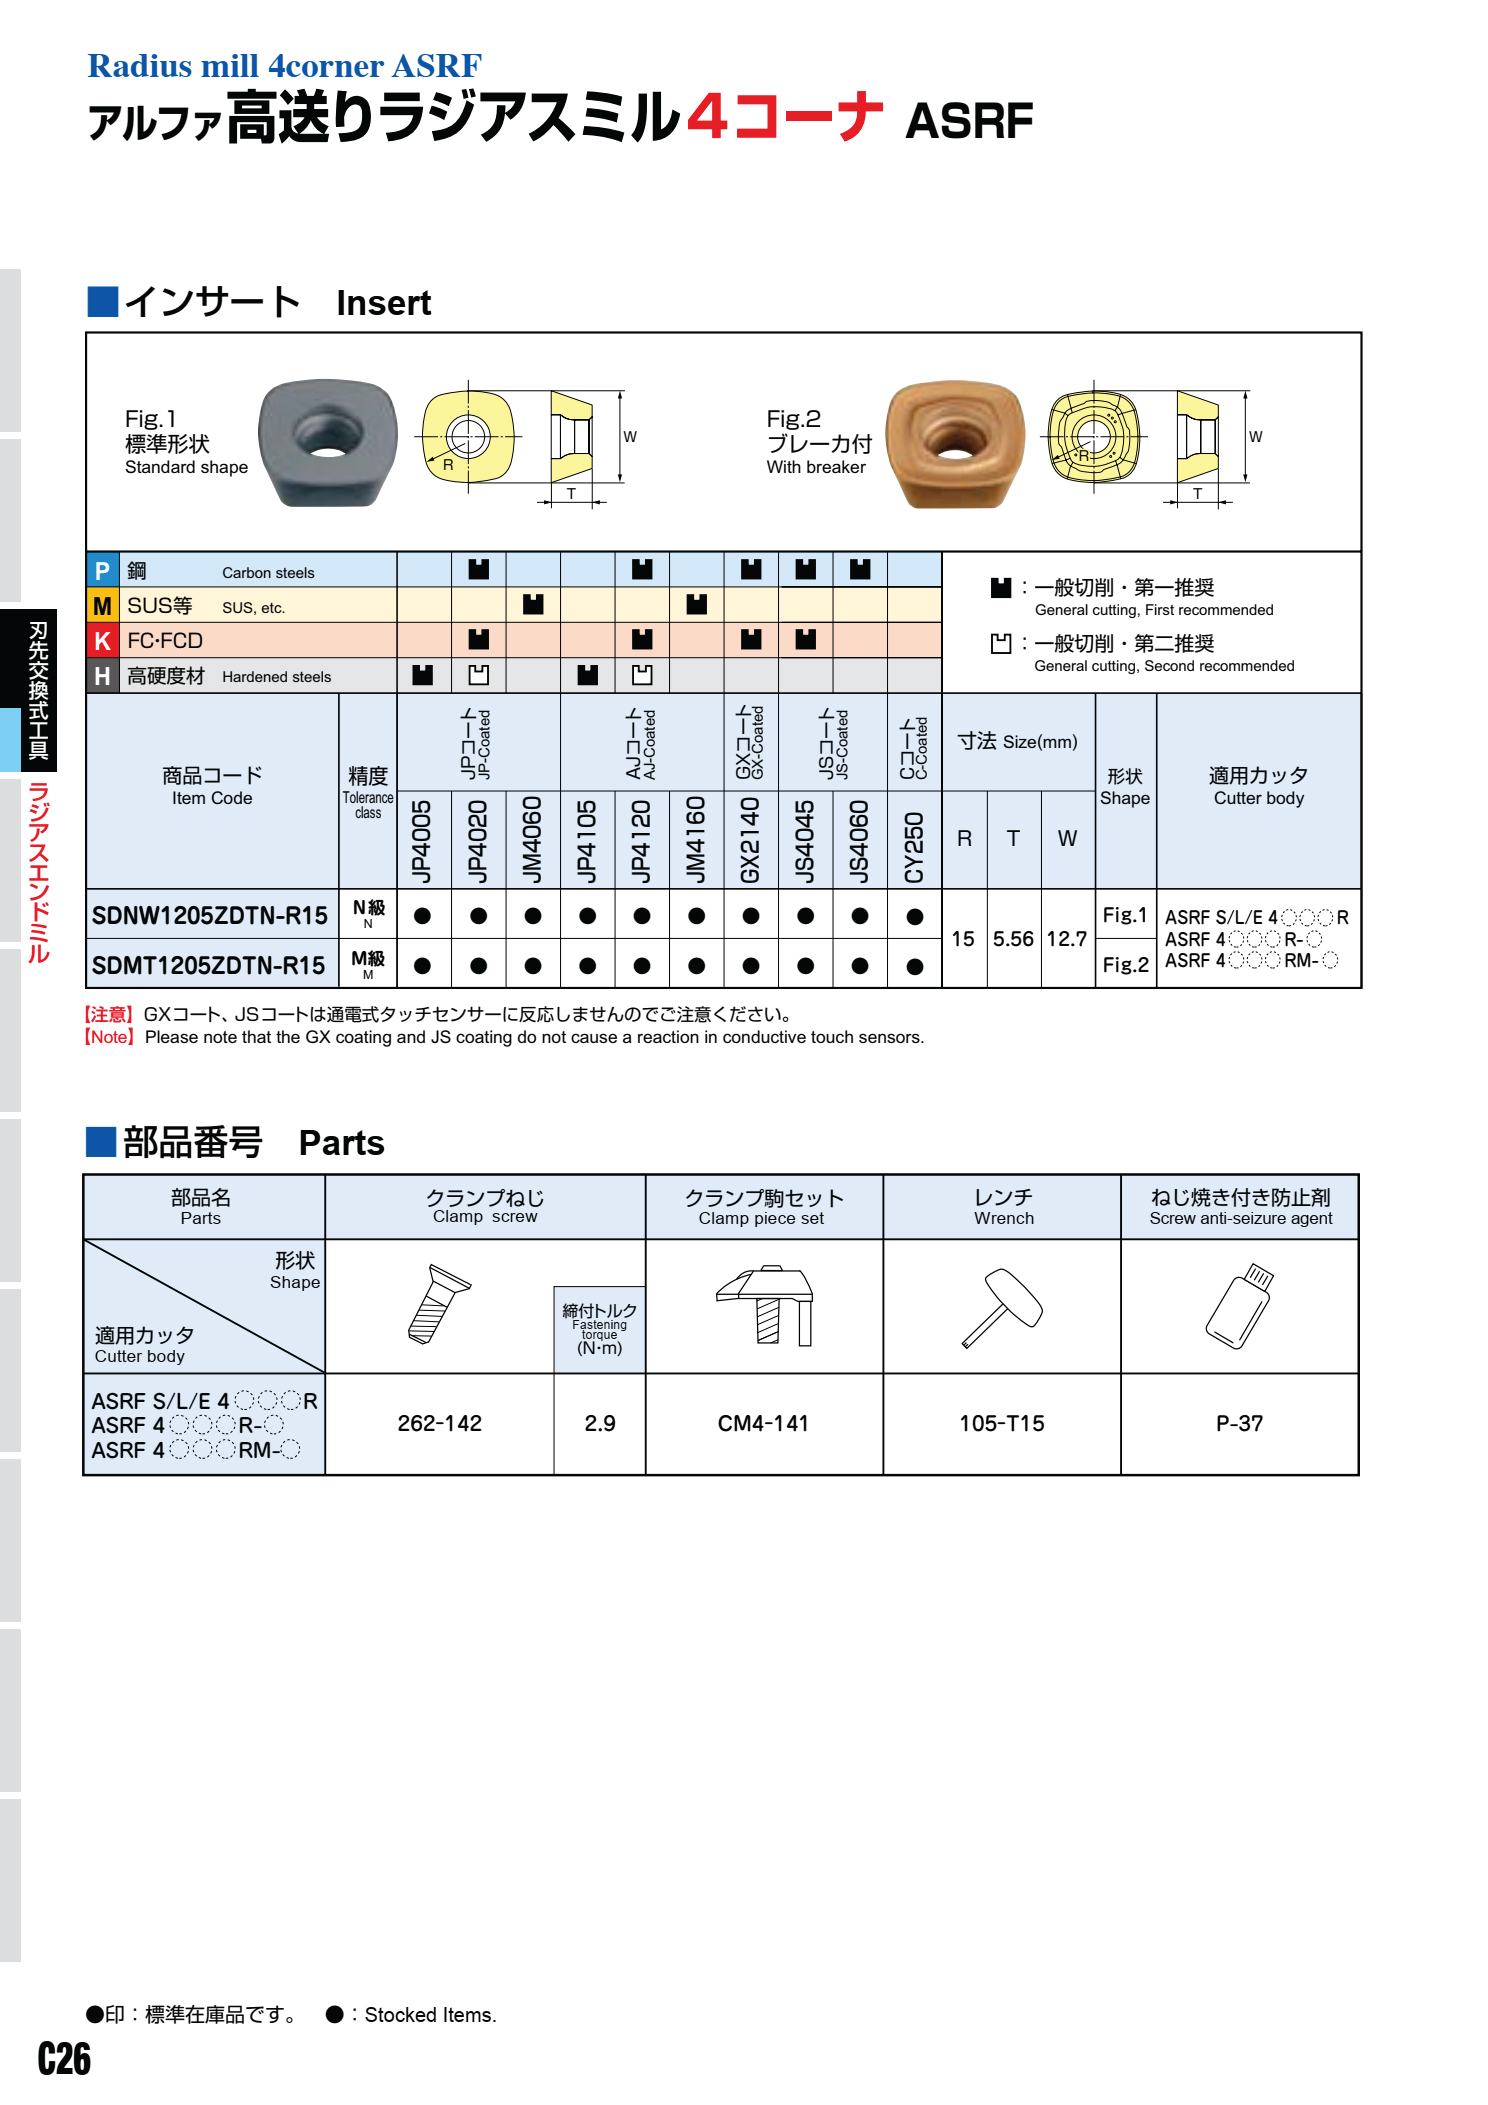 Mảnh Insert Phay Hitachi Moldino WDNW - WDMT Lắp Cán ASRF 1